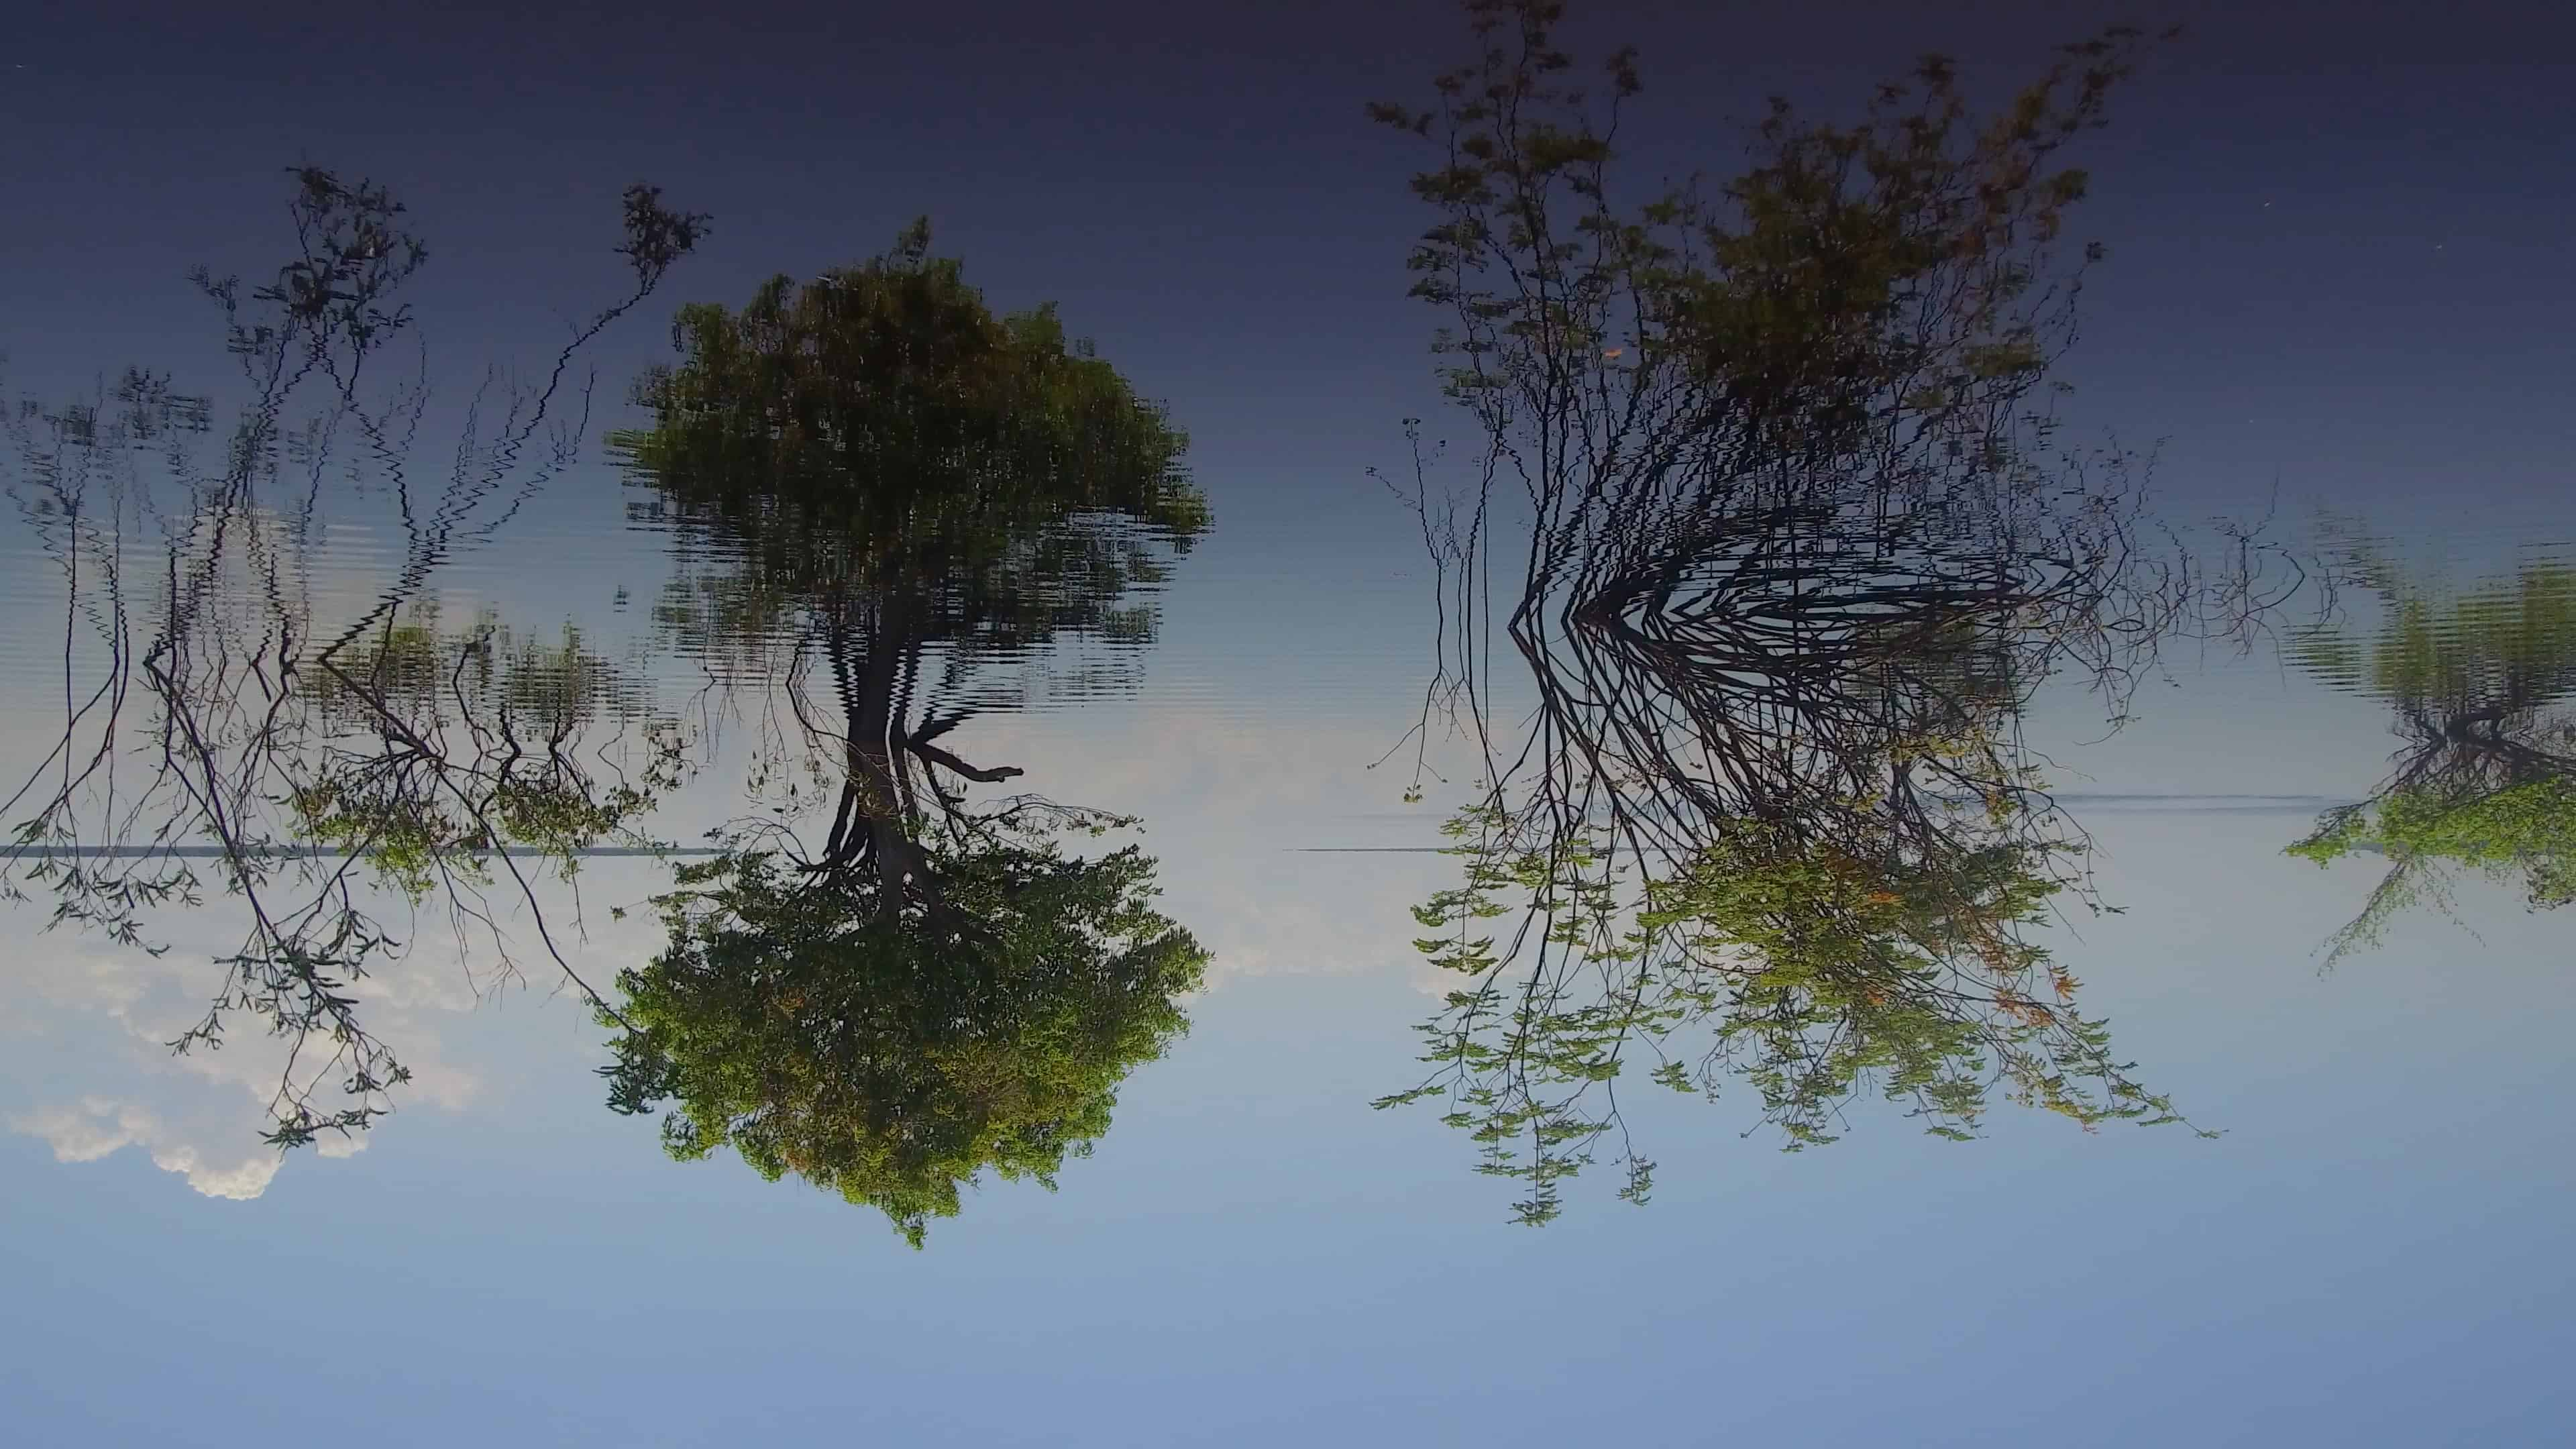 Alexandra_Lerman_Tree_Time_Still_9